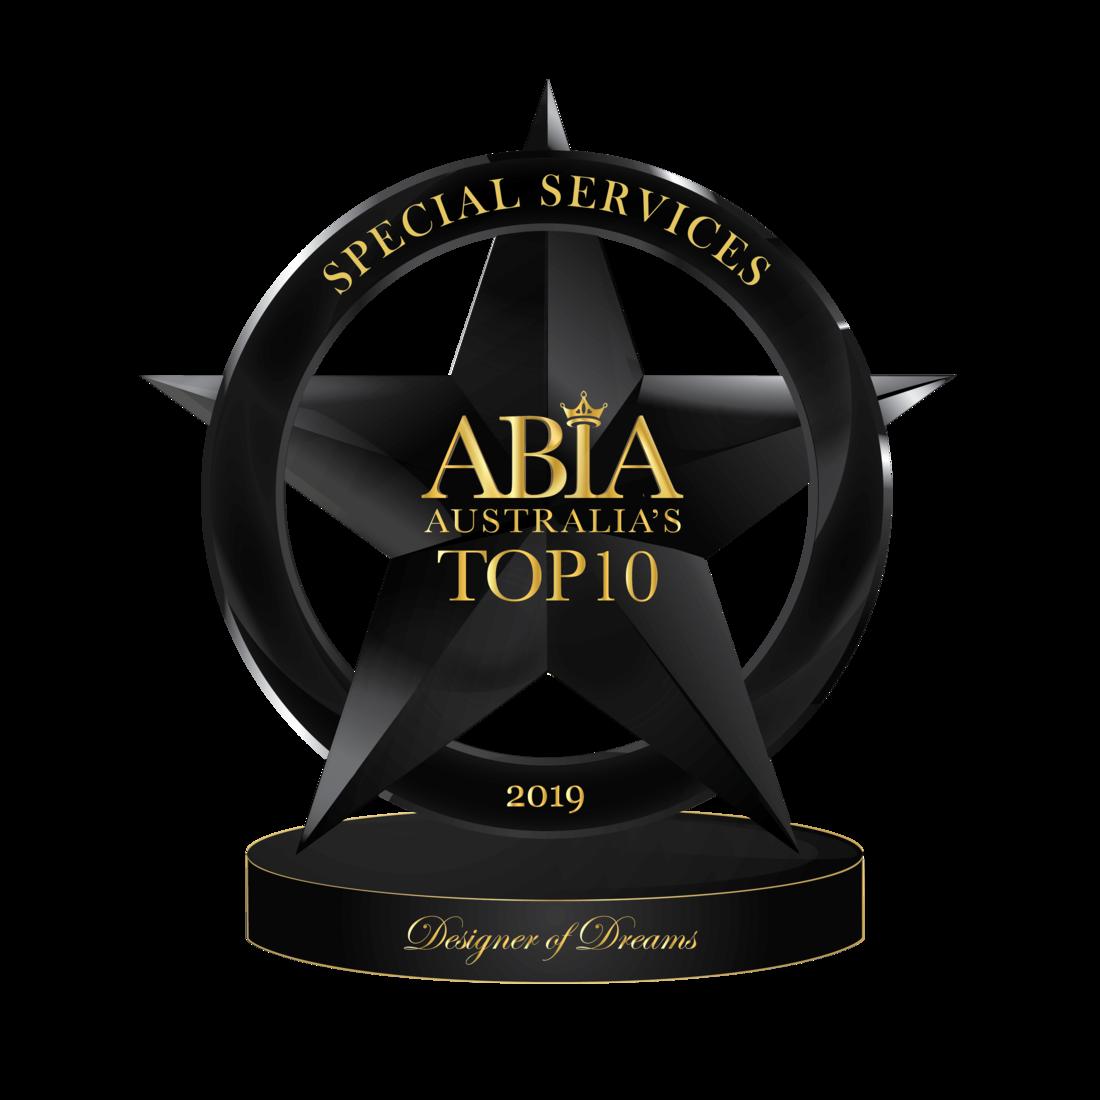 ABIA Top 10 Aust